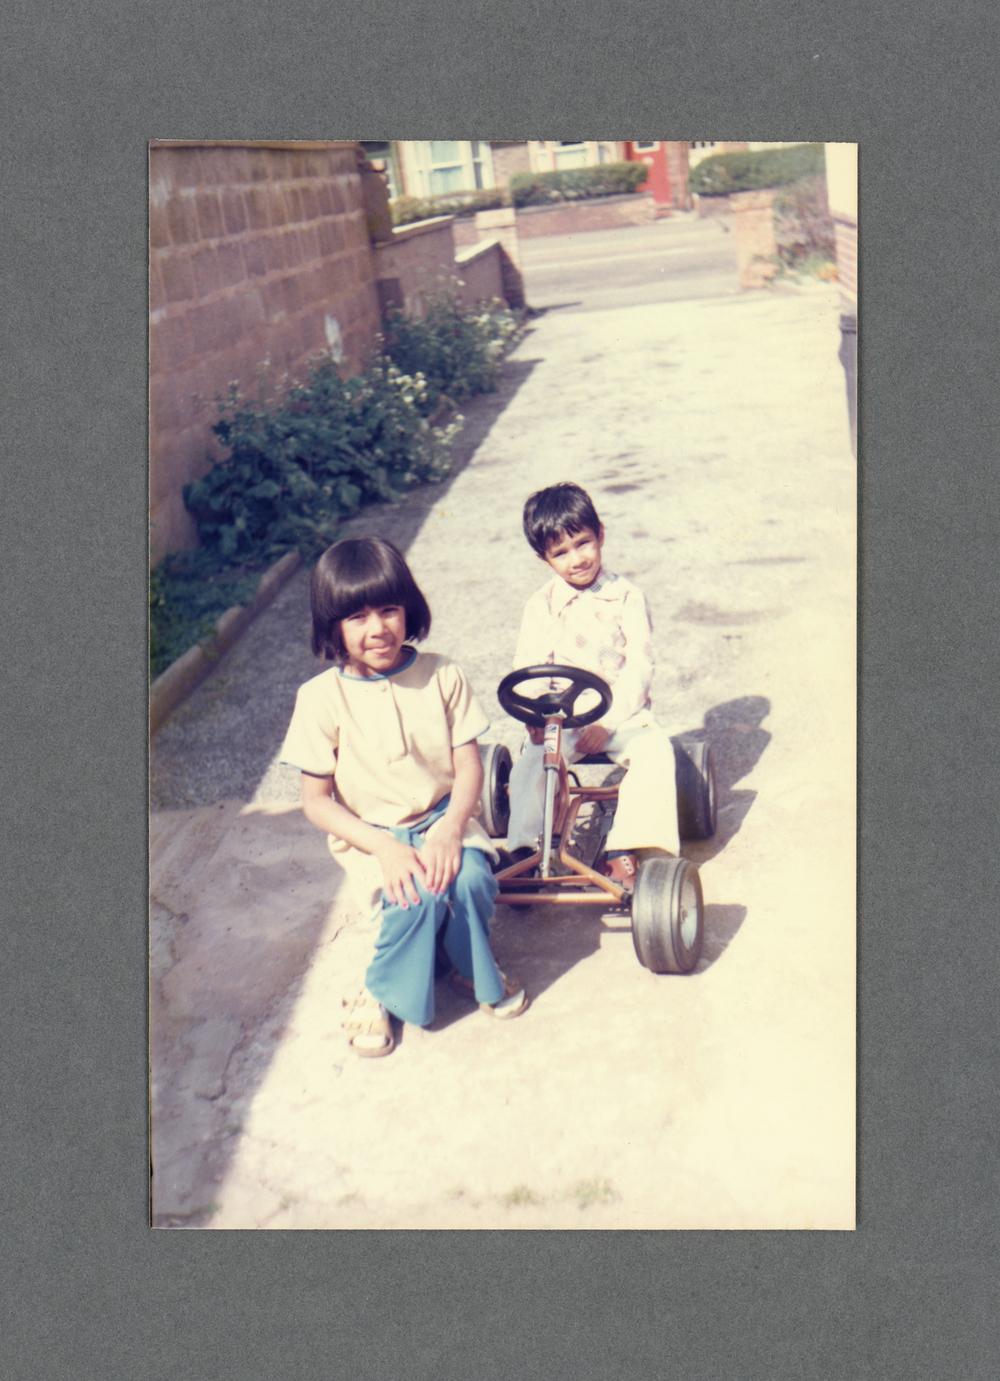 Willenhall Rd. c.1980